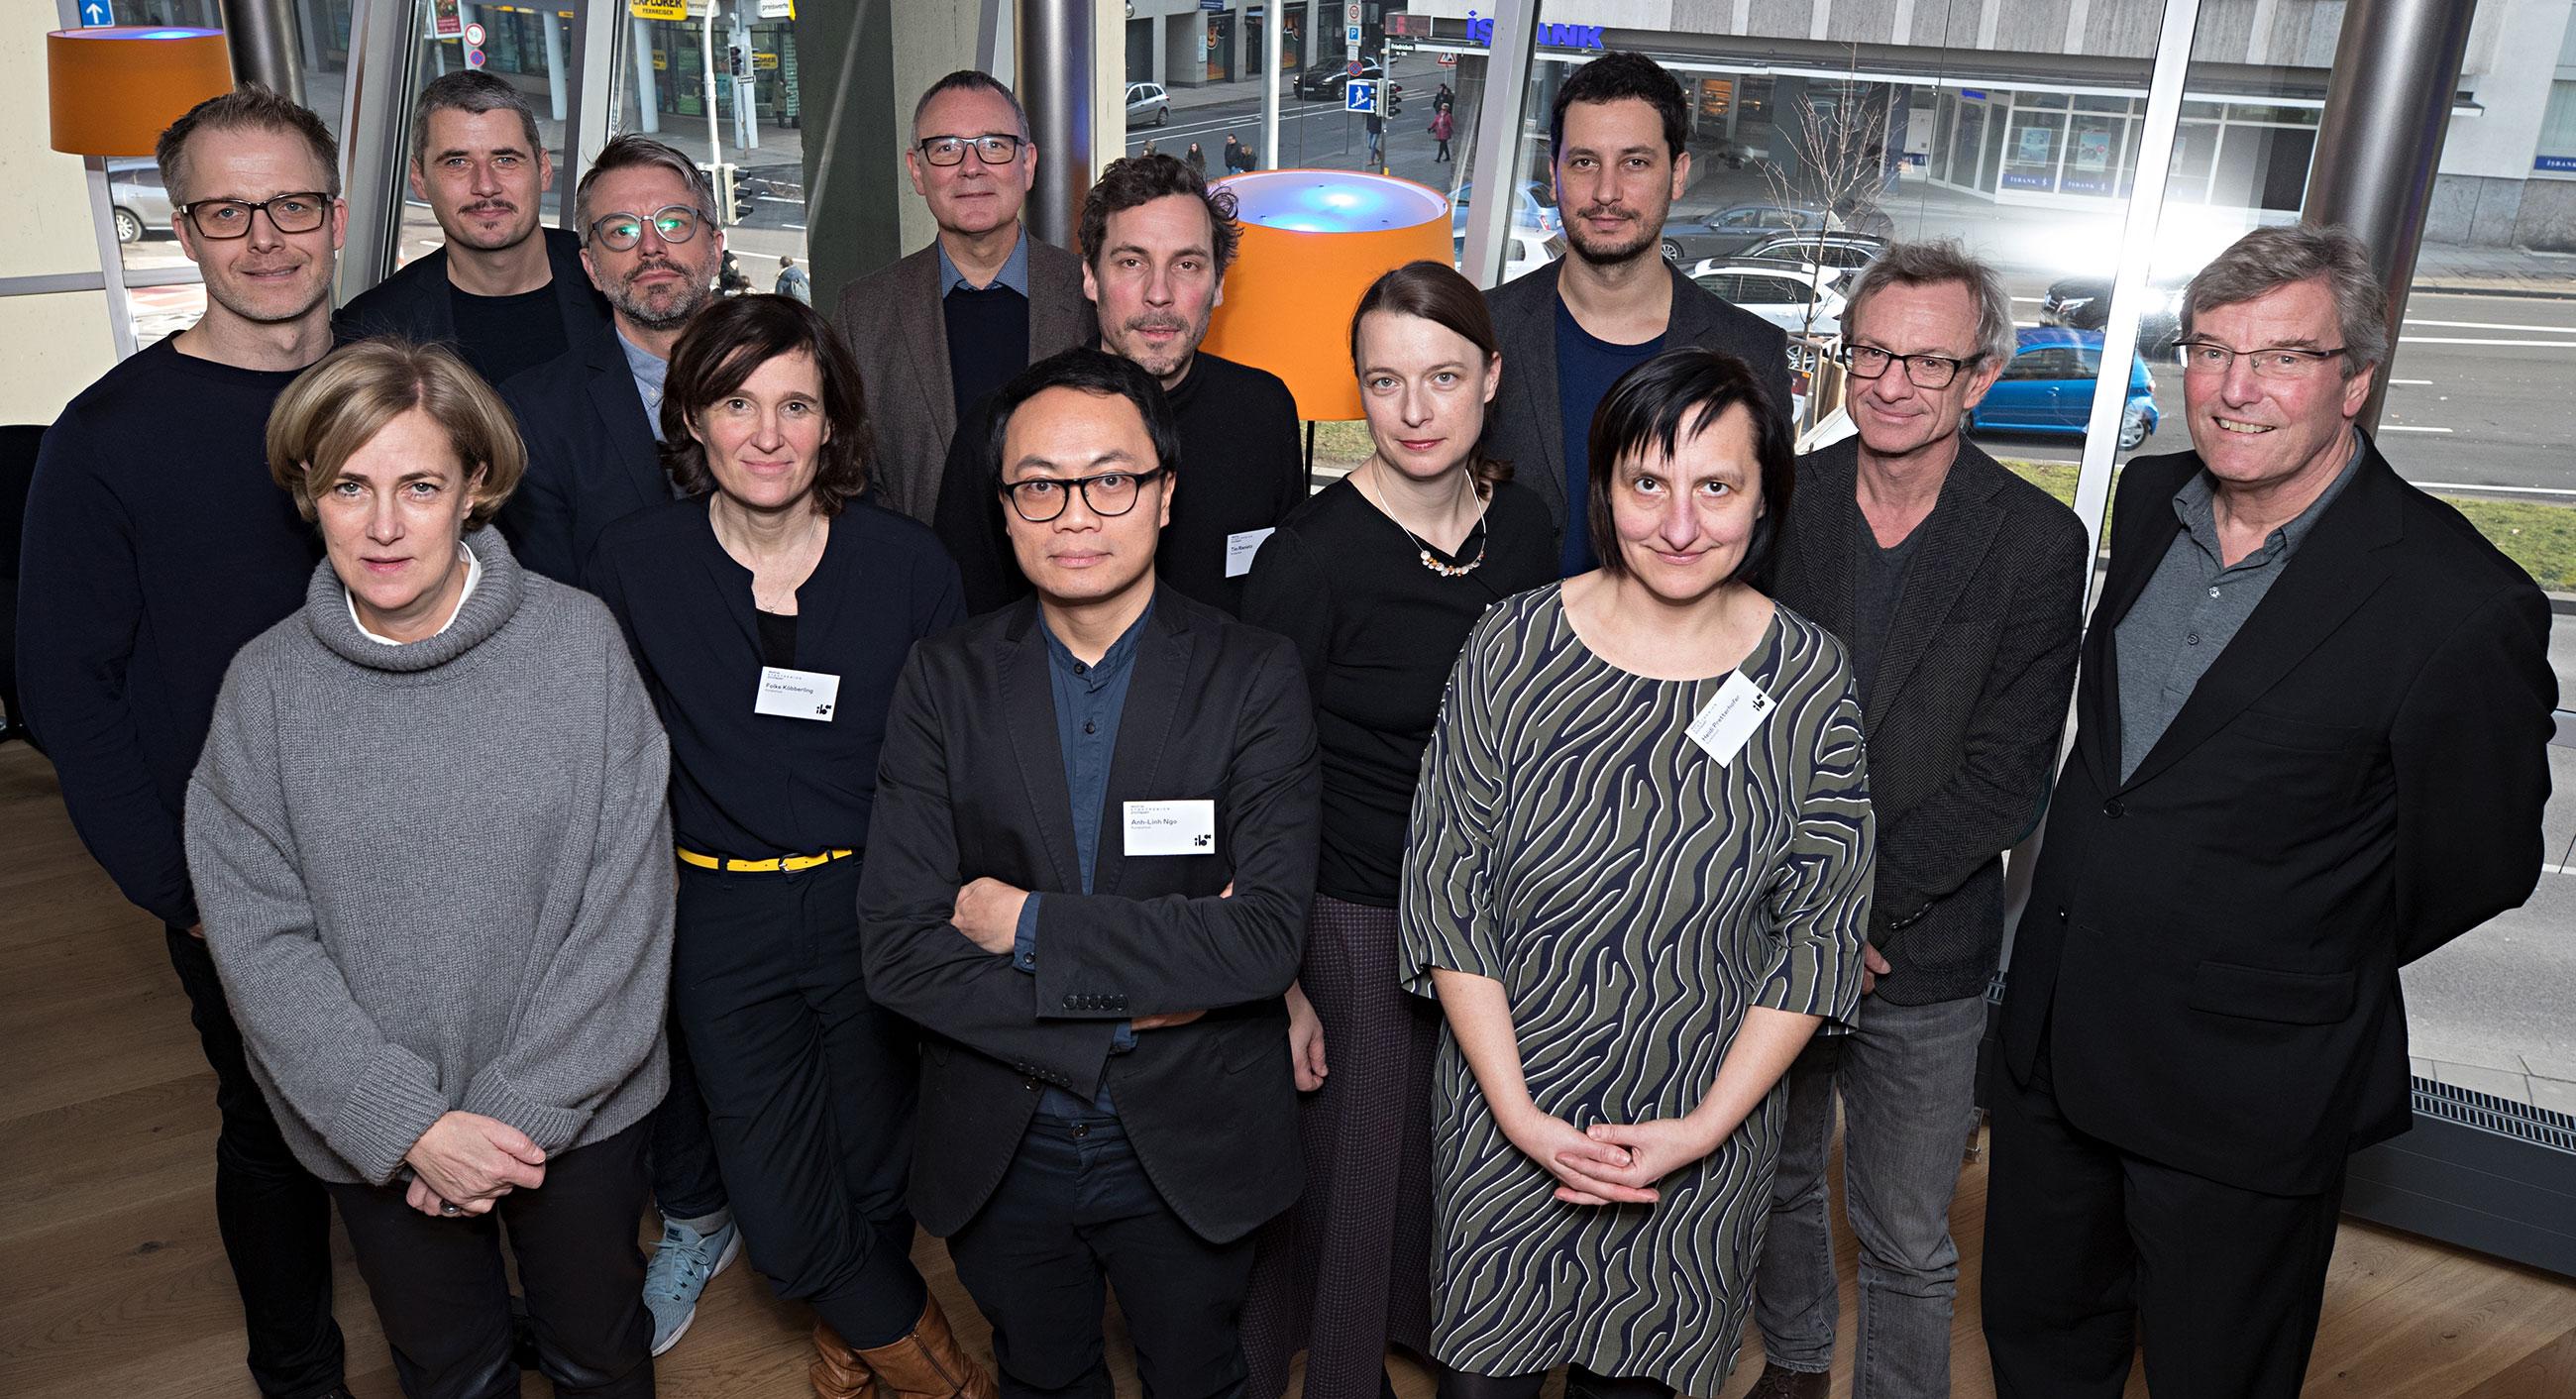 Gruppenfoto der ersten Sitzung des Kuratoriums der Internationalen Bauausstellung 2027 StadtRegion Stuttgart (4.2.2019, Stuttgart). Foto: IBA'27 / Franziska Kraufmann